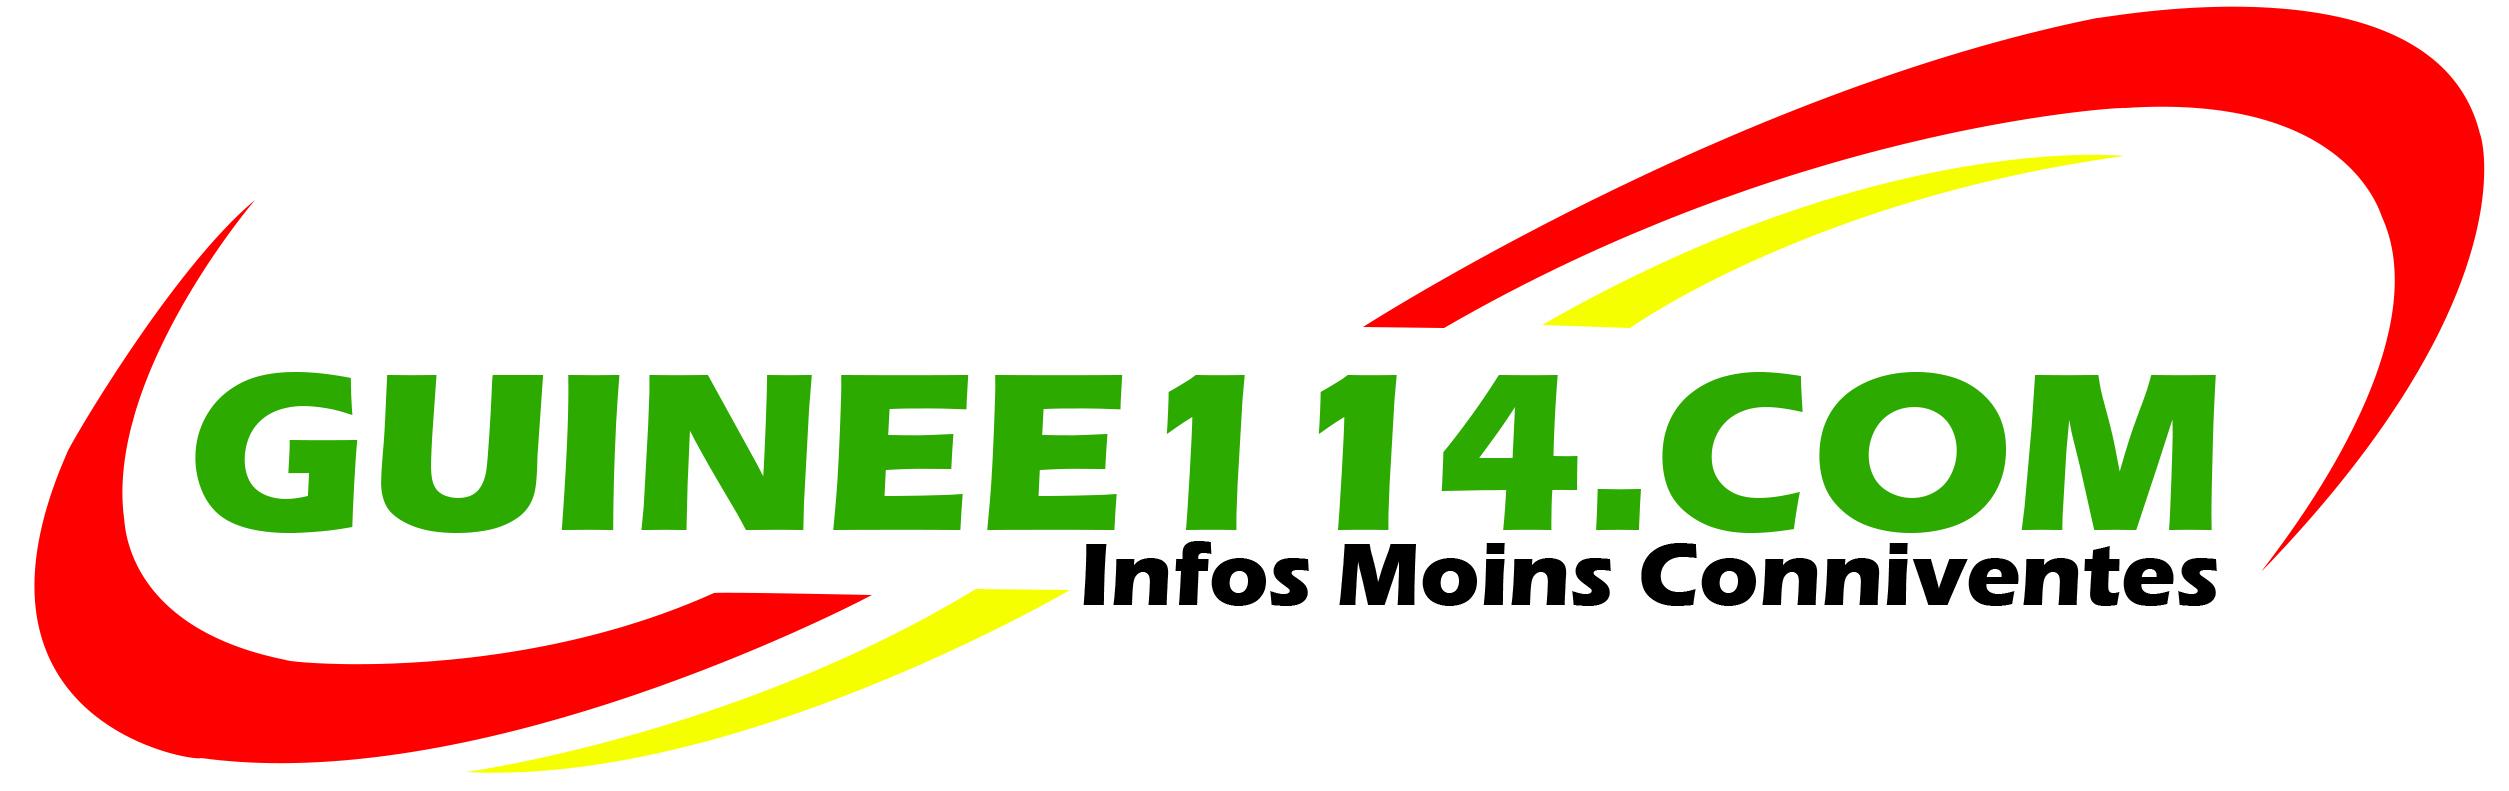 Guinee114